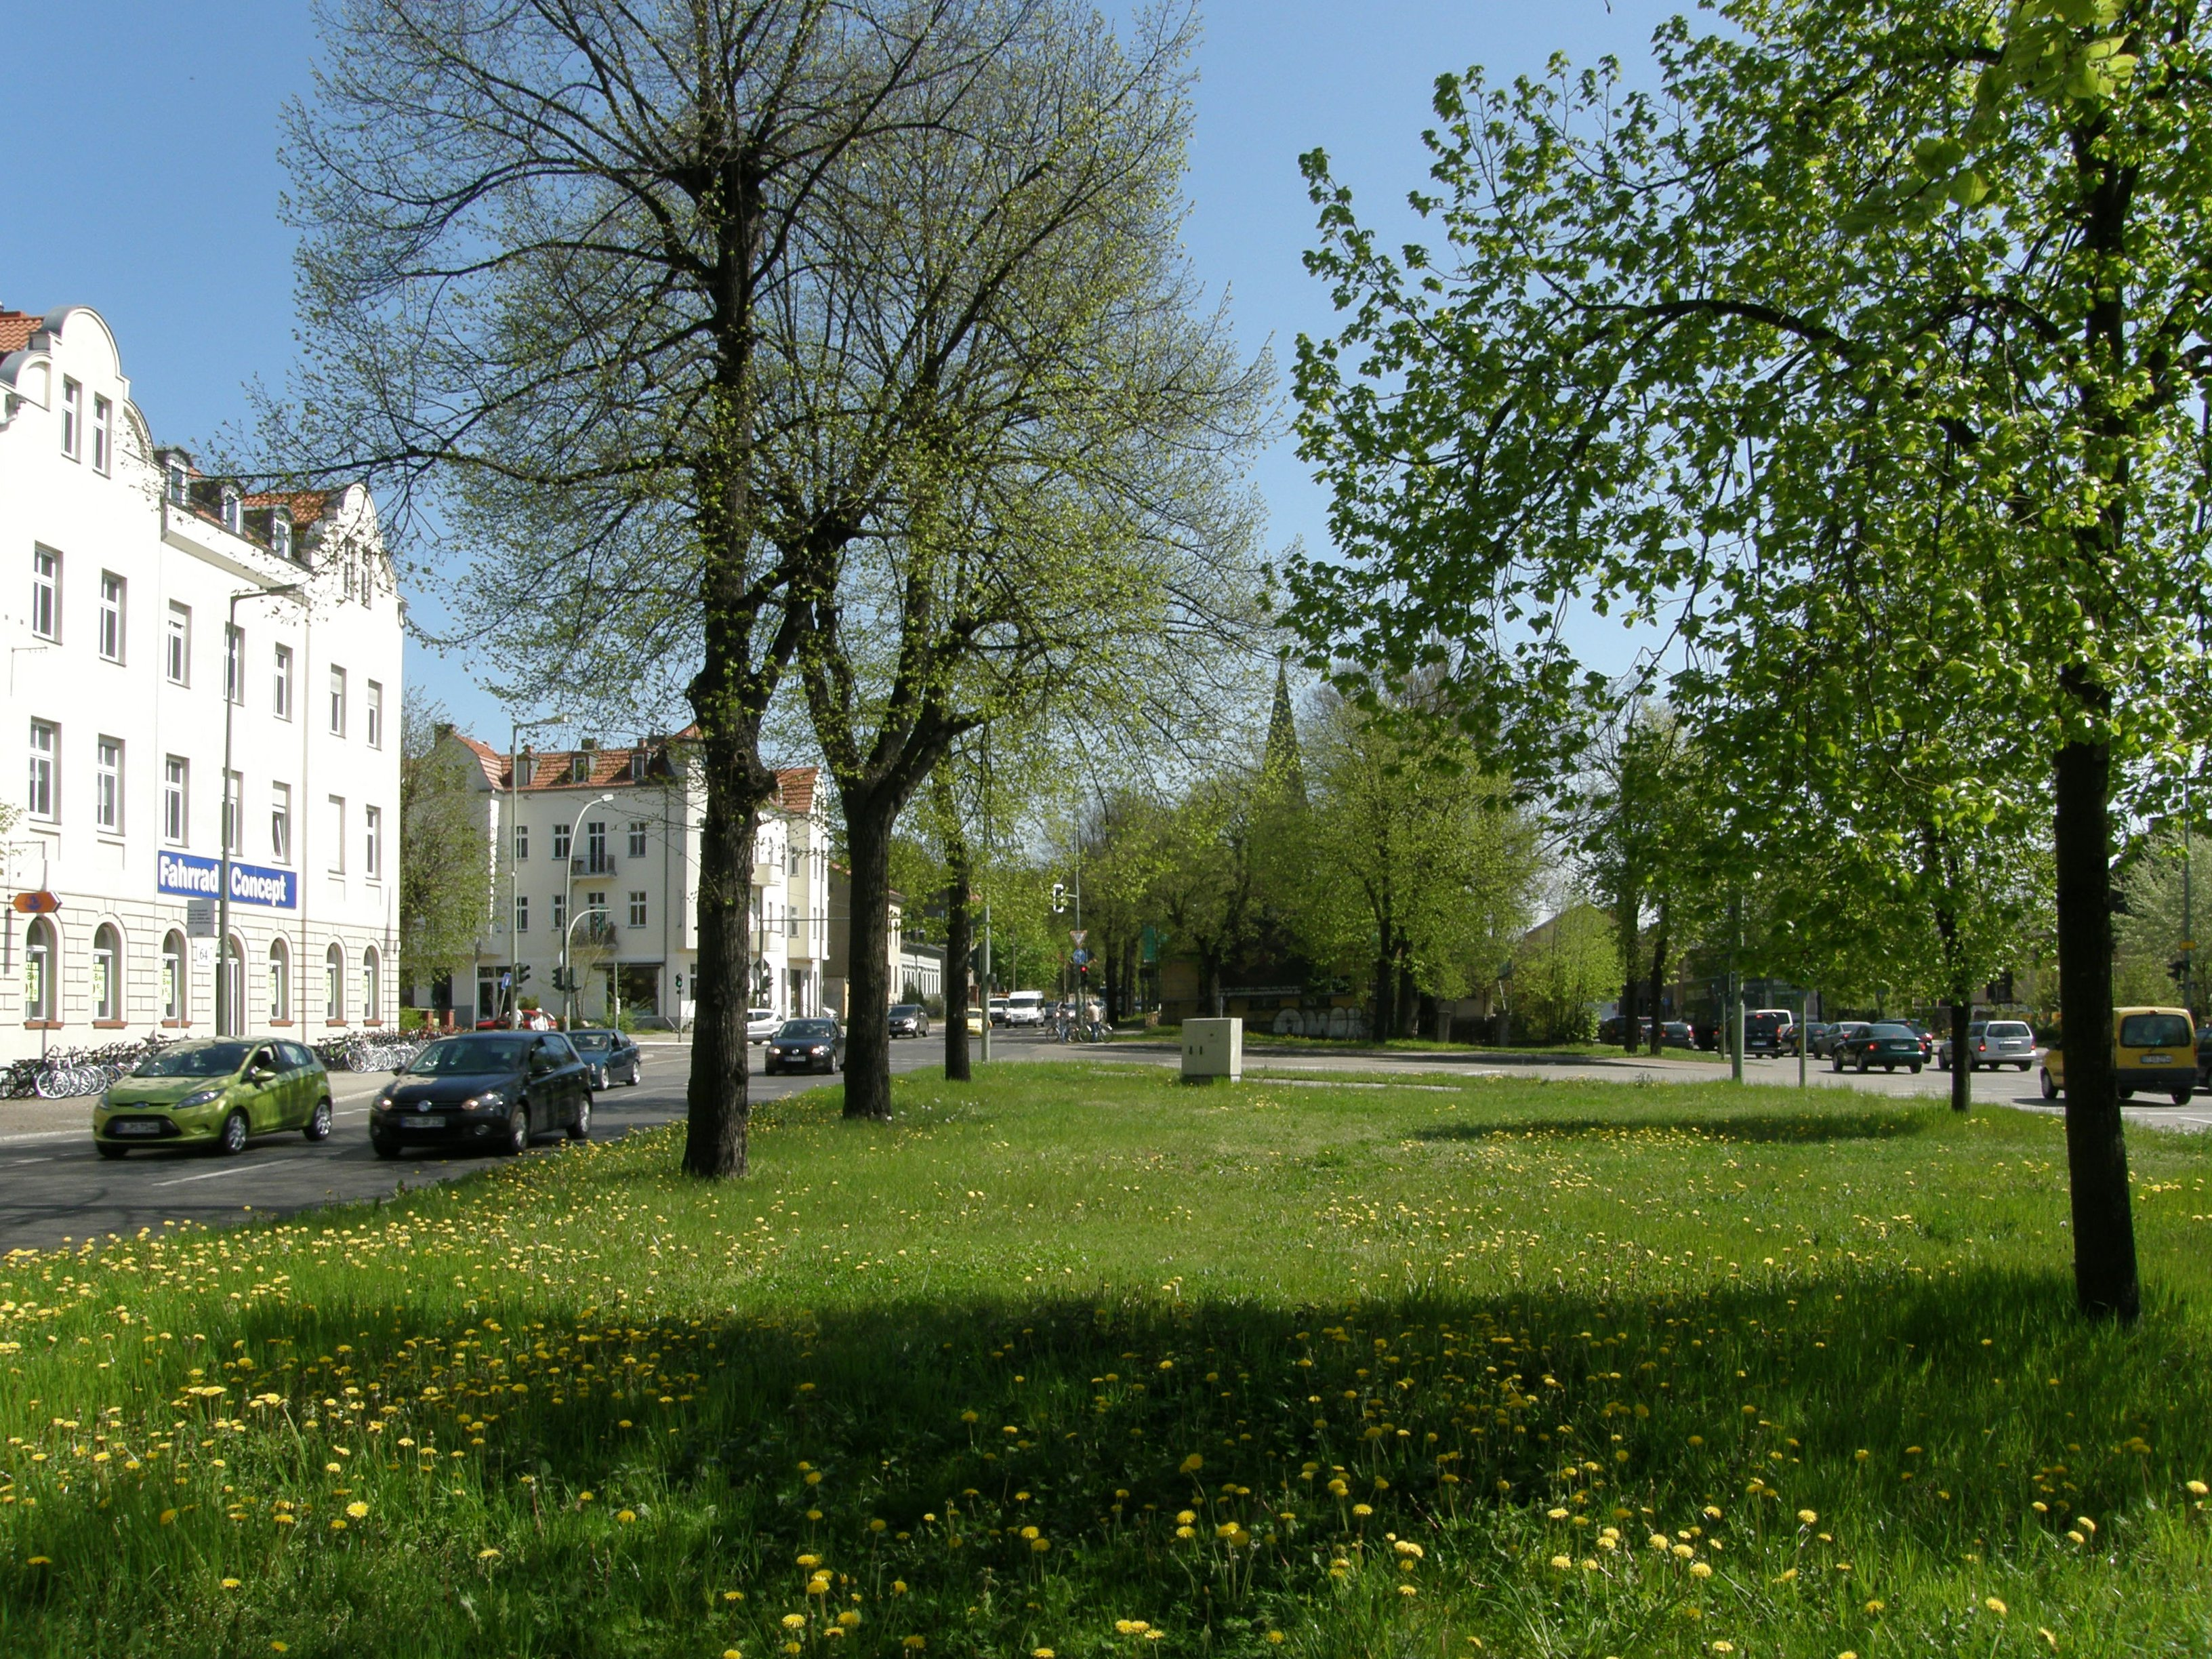 Datei:Alt-Biesdorf 2012-4-27 ama fec 352.JPG – Wikipedia